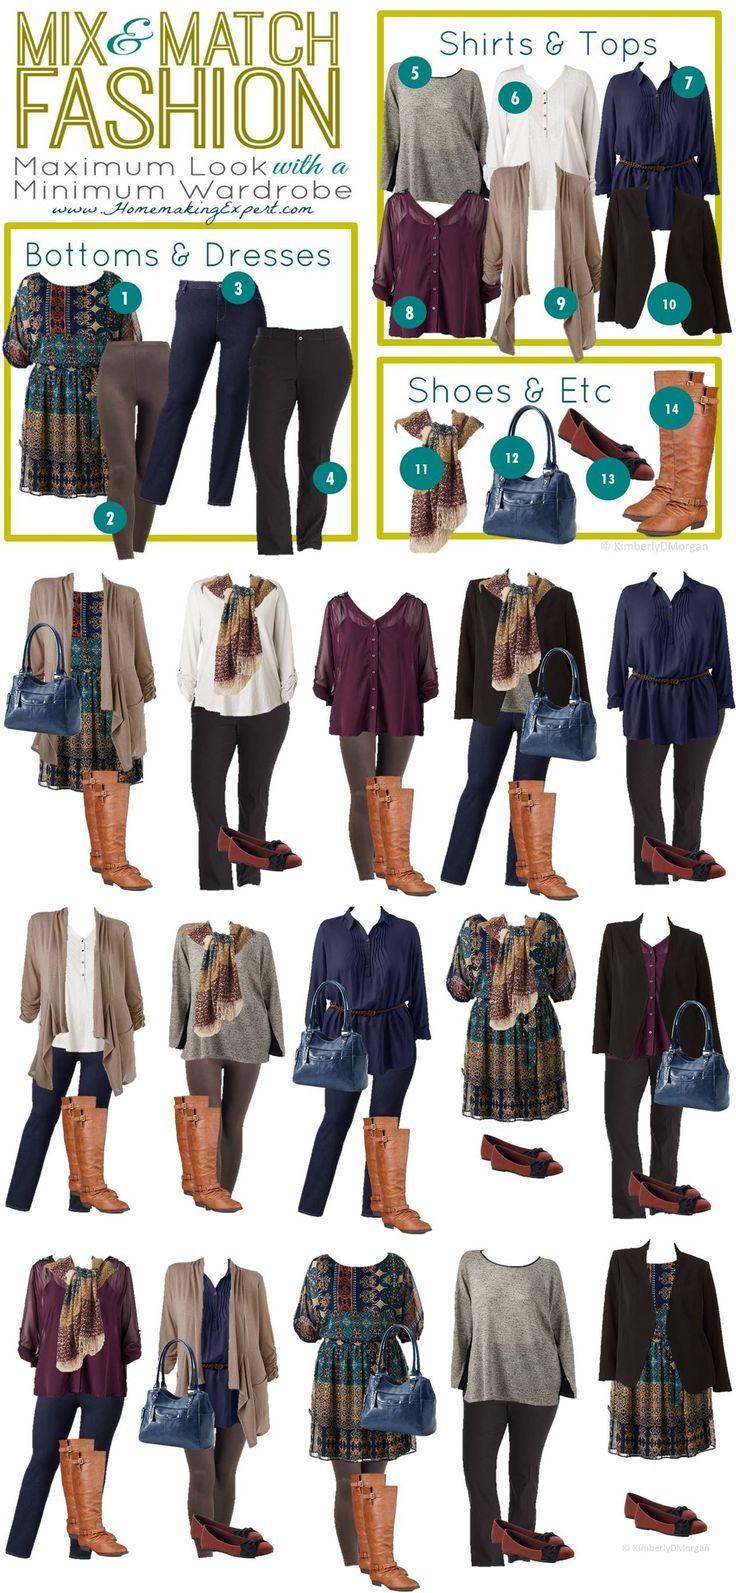 125 Kohls Plus Size Mix Match Vertical Fashion I Love